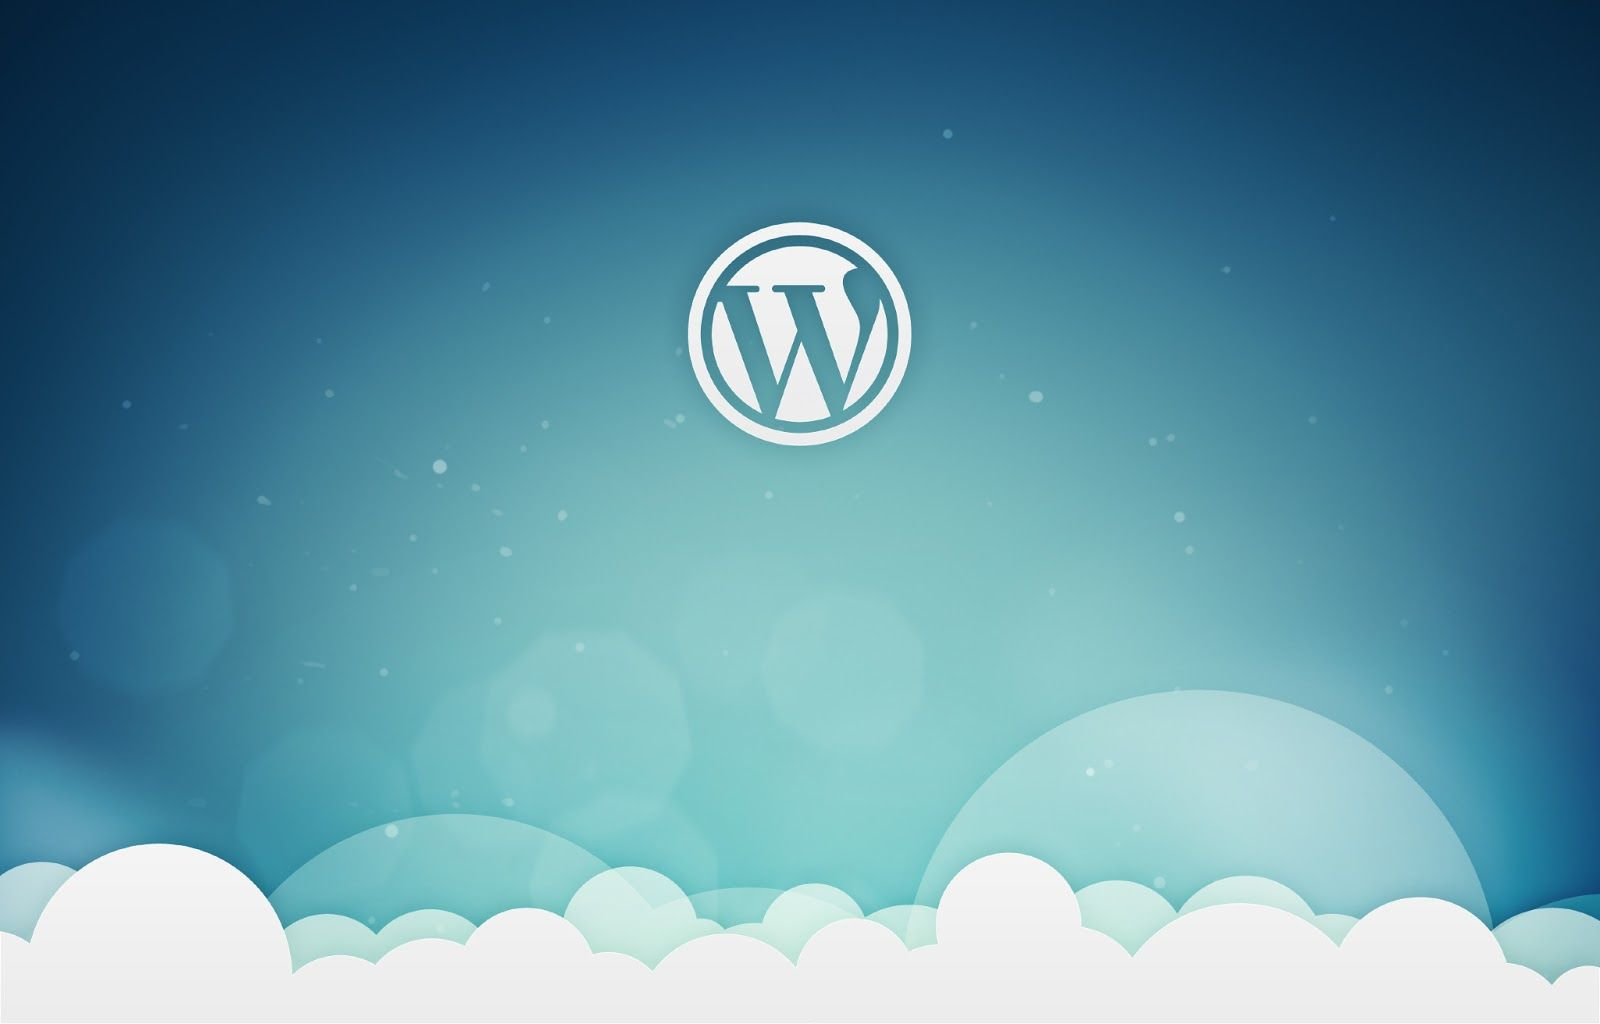 wordpress logo computer wallpaper 74195